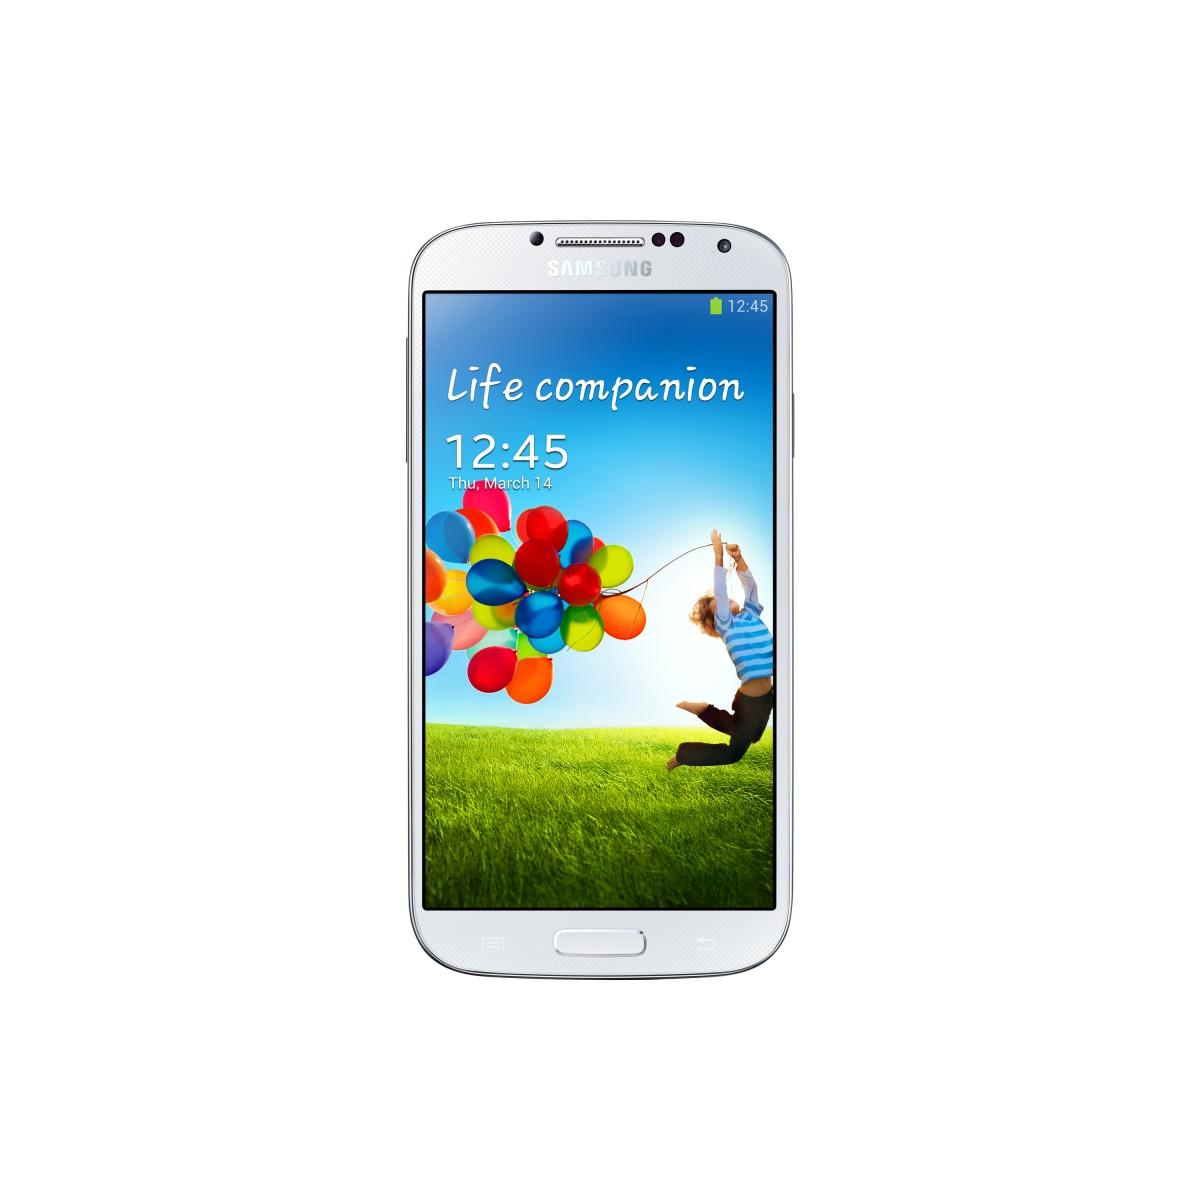 Smartphone Desbloqueado Galaxy S4 GT-I9505 Branco, Quad Core 1.9 GHz, 4G Android 4.2 Wi-Fi Camera 13MP Tela 5 - Samsung